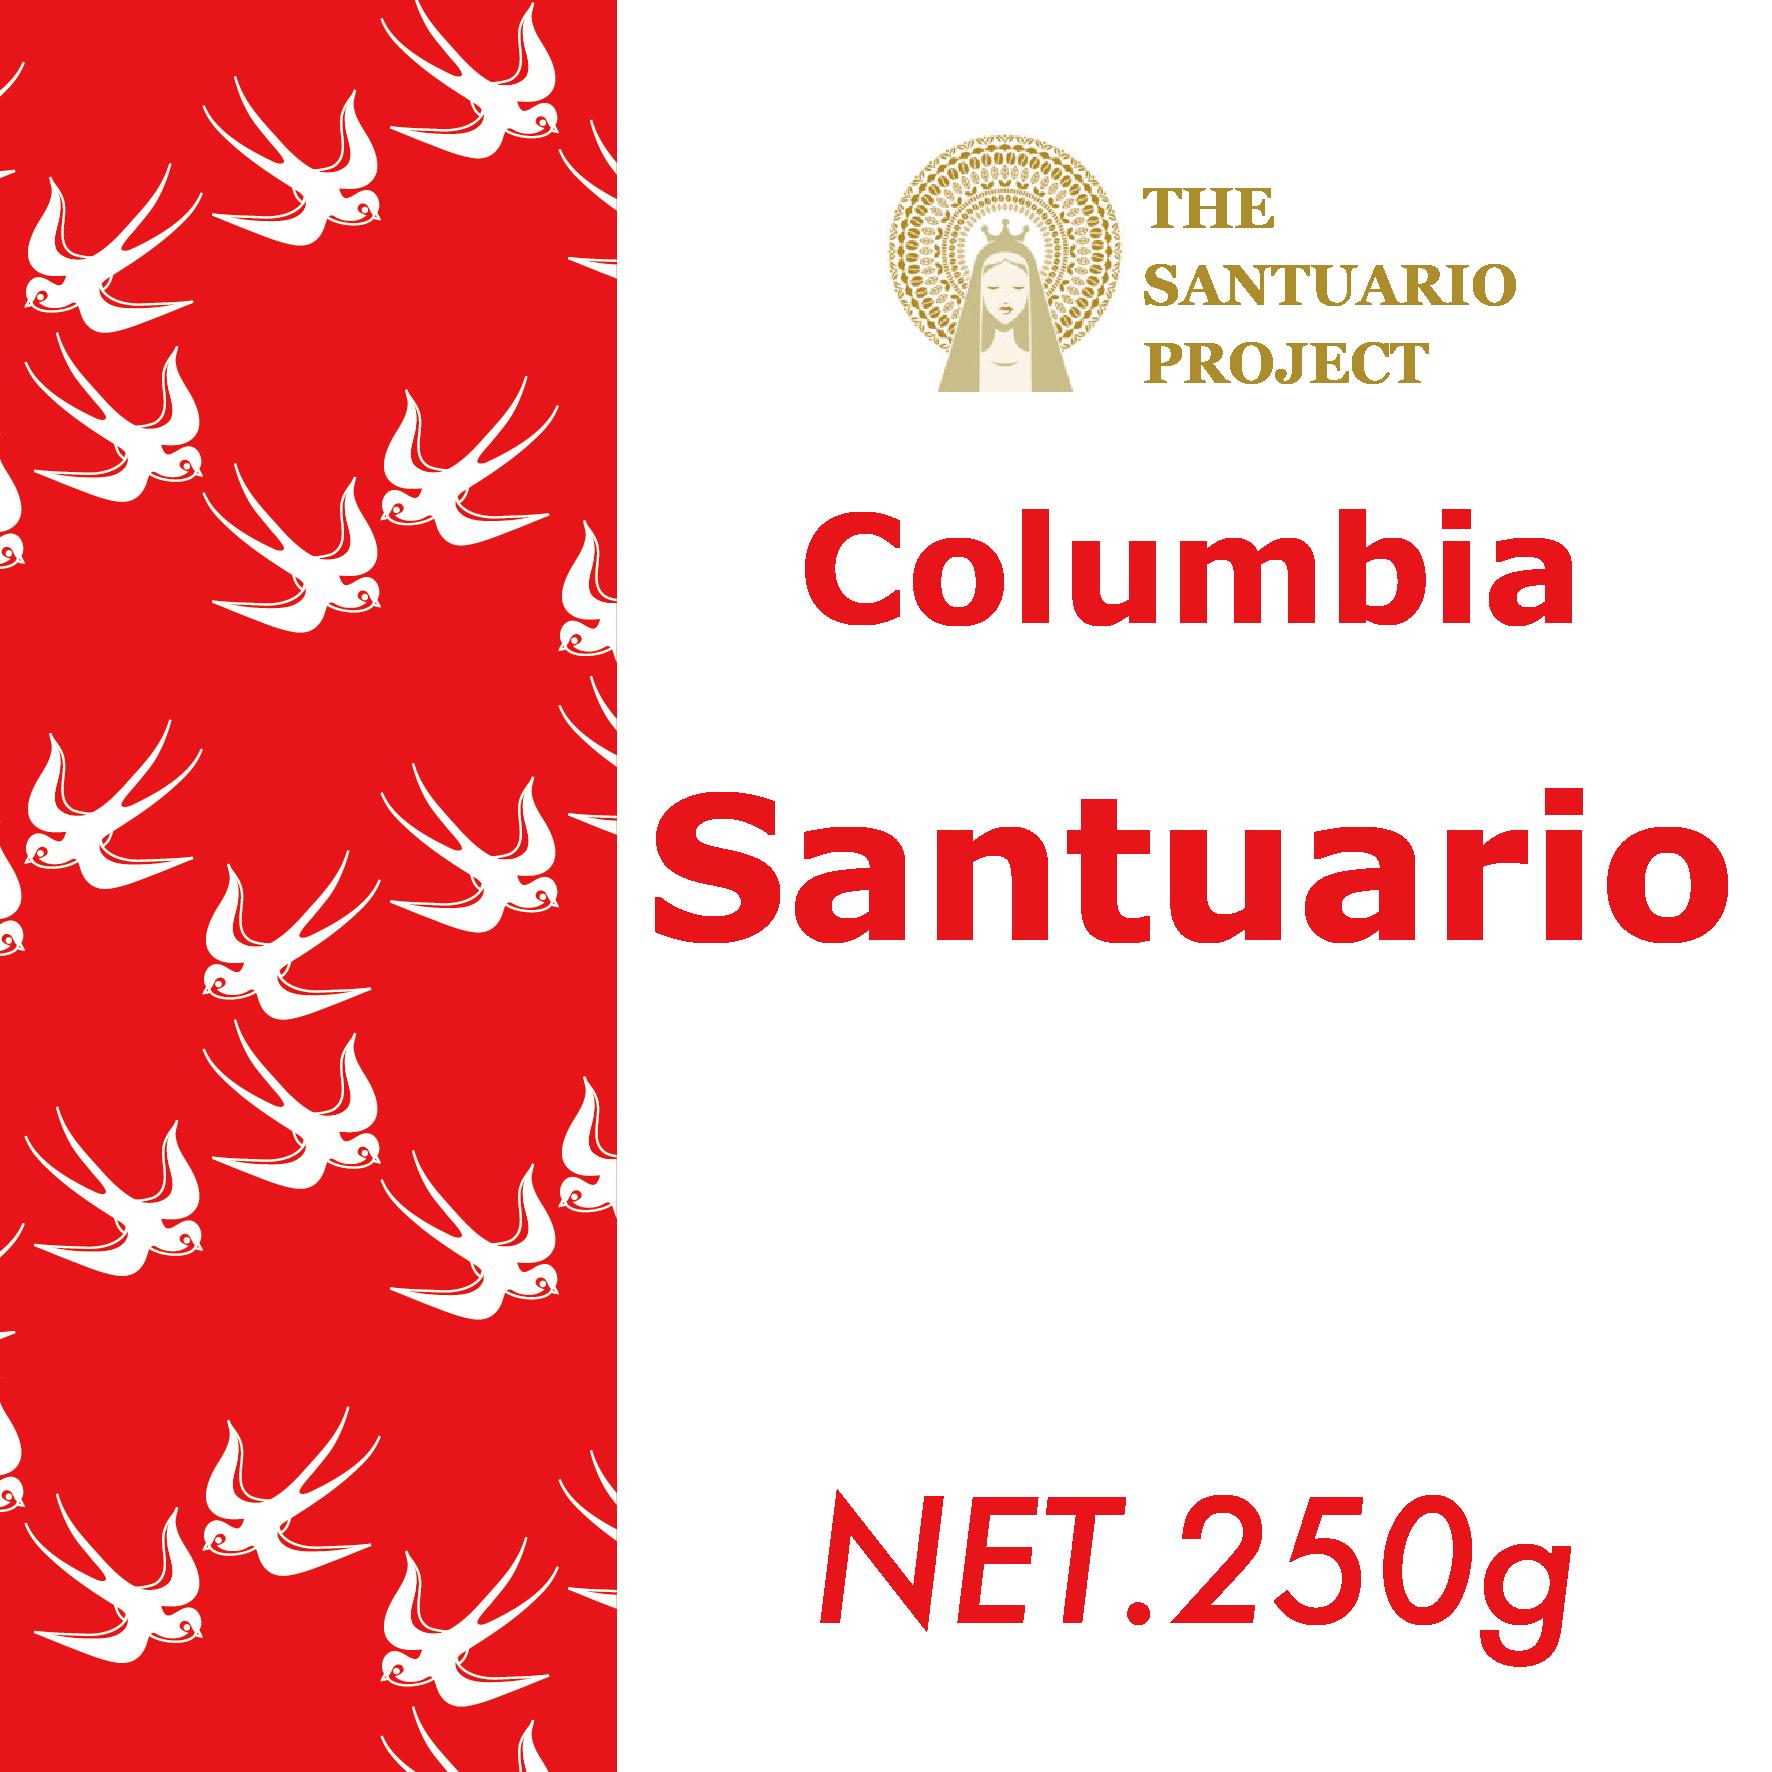 250g コロンビア・サントゥアリオ農園